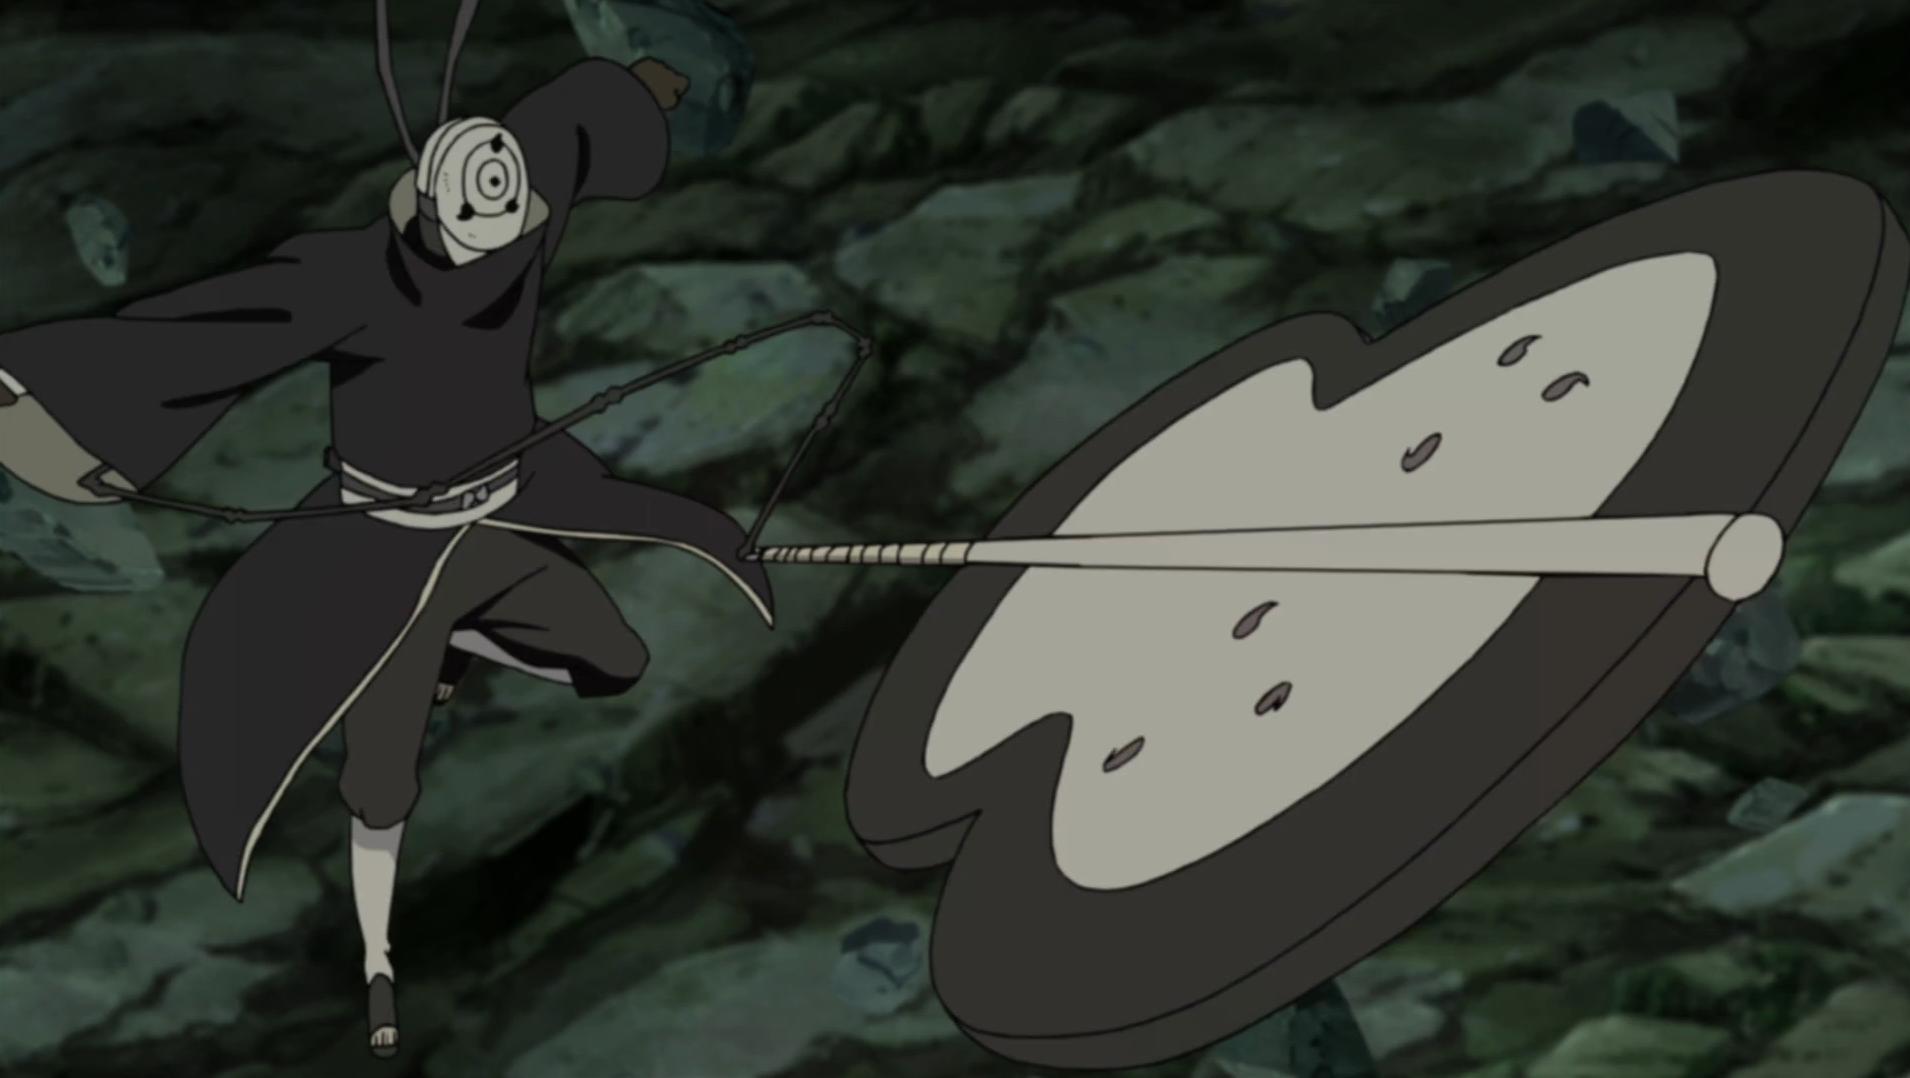 Gunbai | Narutopedia | Fandom powered by Wikia